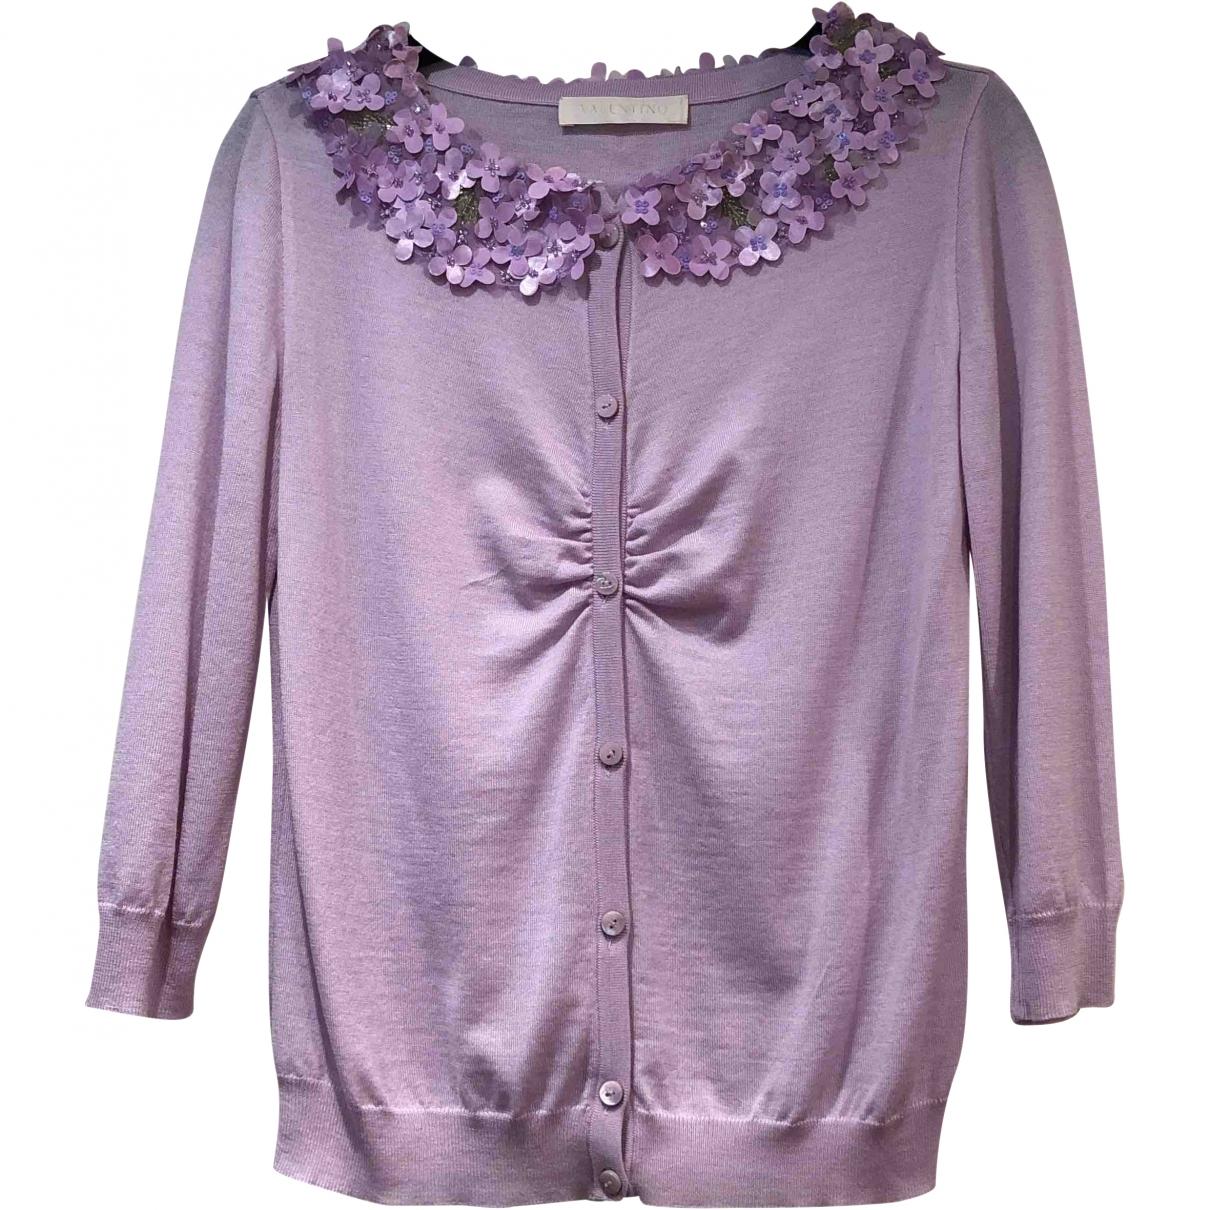 Valentino Garavani \N Wool Knitwear for Women M International